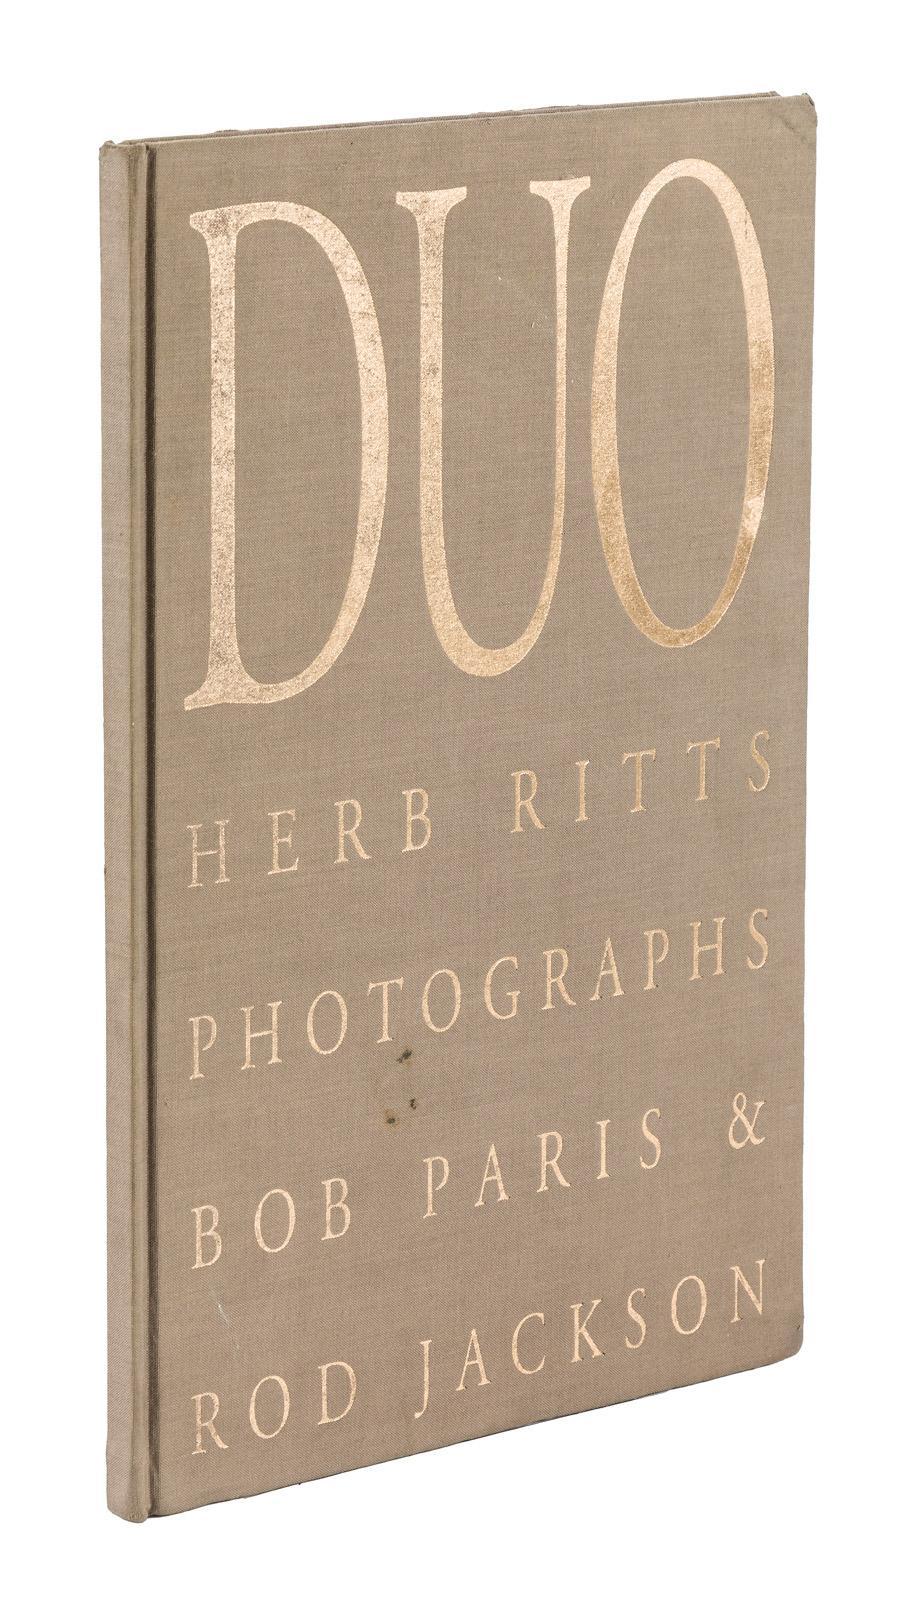 duo herb ritts photographs bob paris amp rod jackson